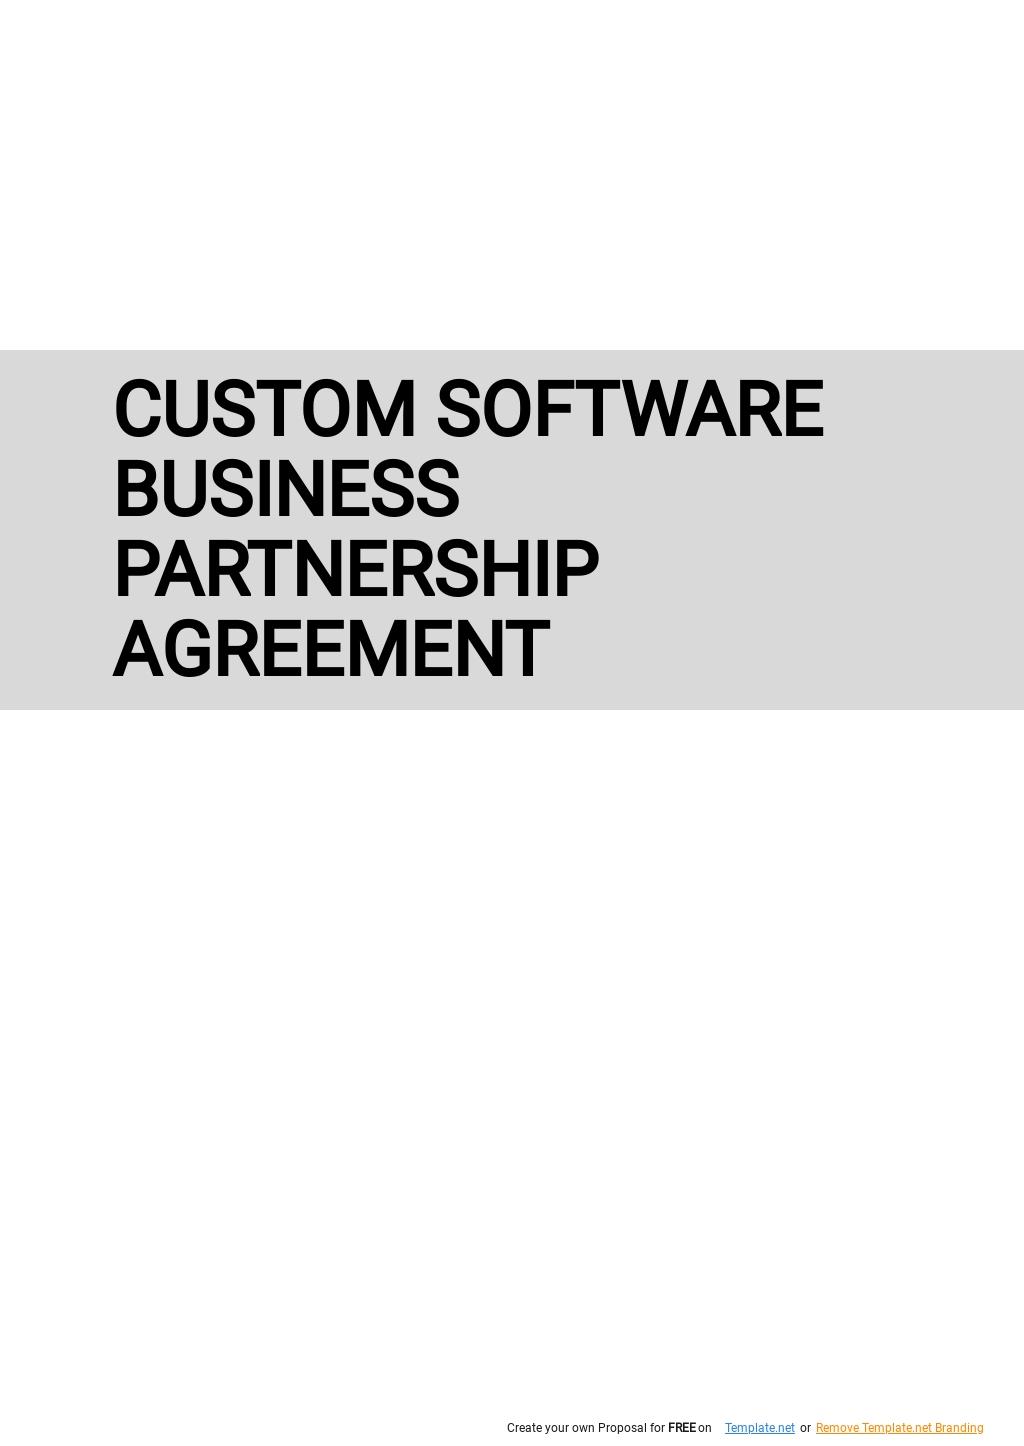 Custom Software Business Partnership Agreement Template.jpe